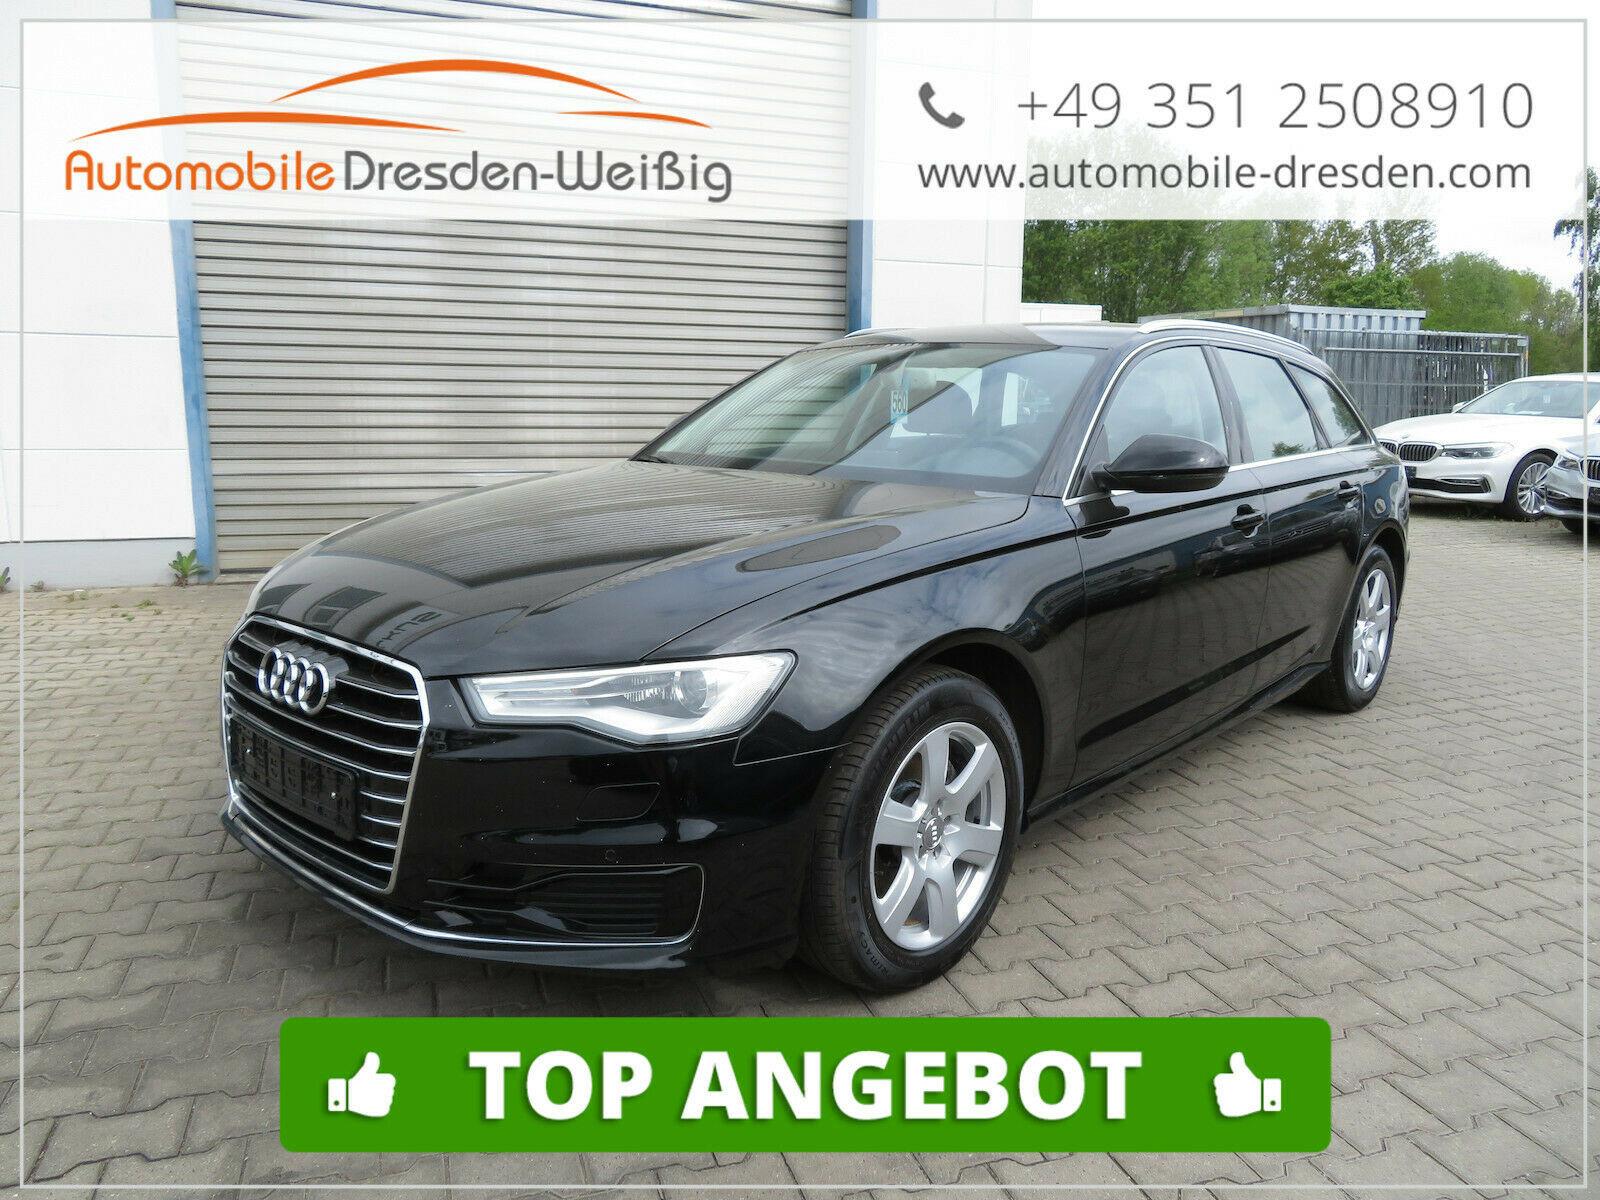 Audi A6 2.0 TDI ultra EU6*Navi*Bi Xenon*, Jahr 2015, Diesel